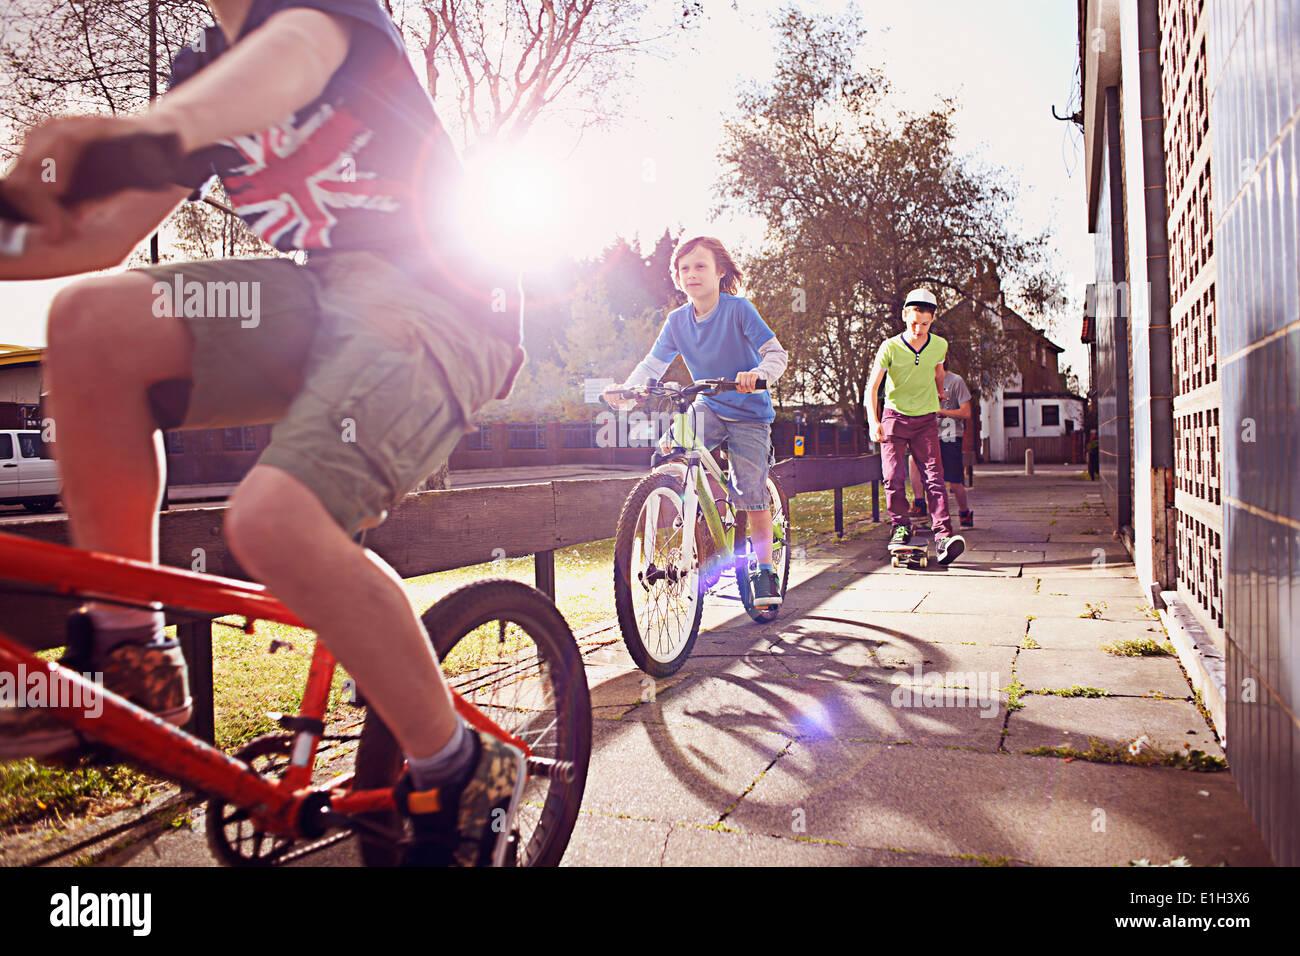 Les garçons riding bikes Photo Stock